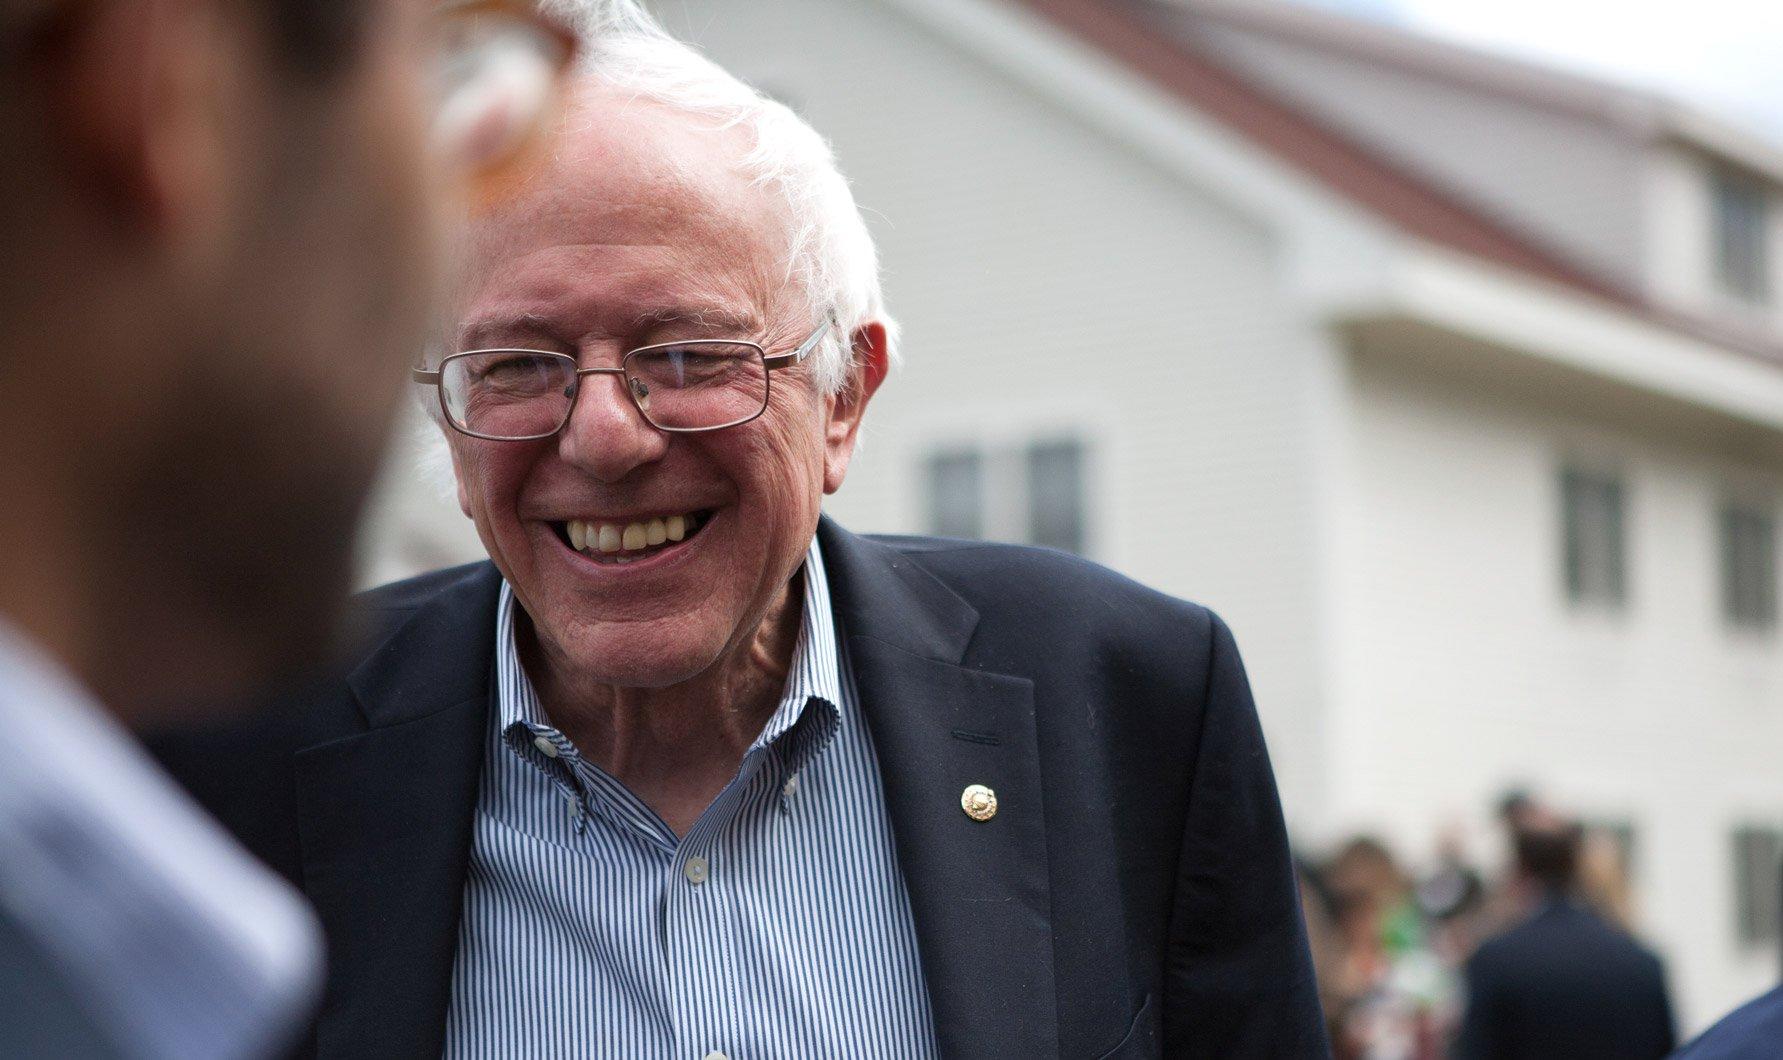 Bernie Sanders to visit UC Davis